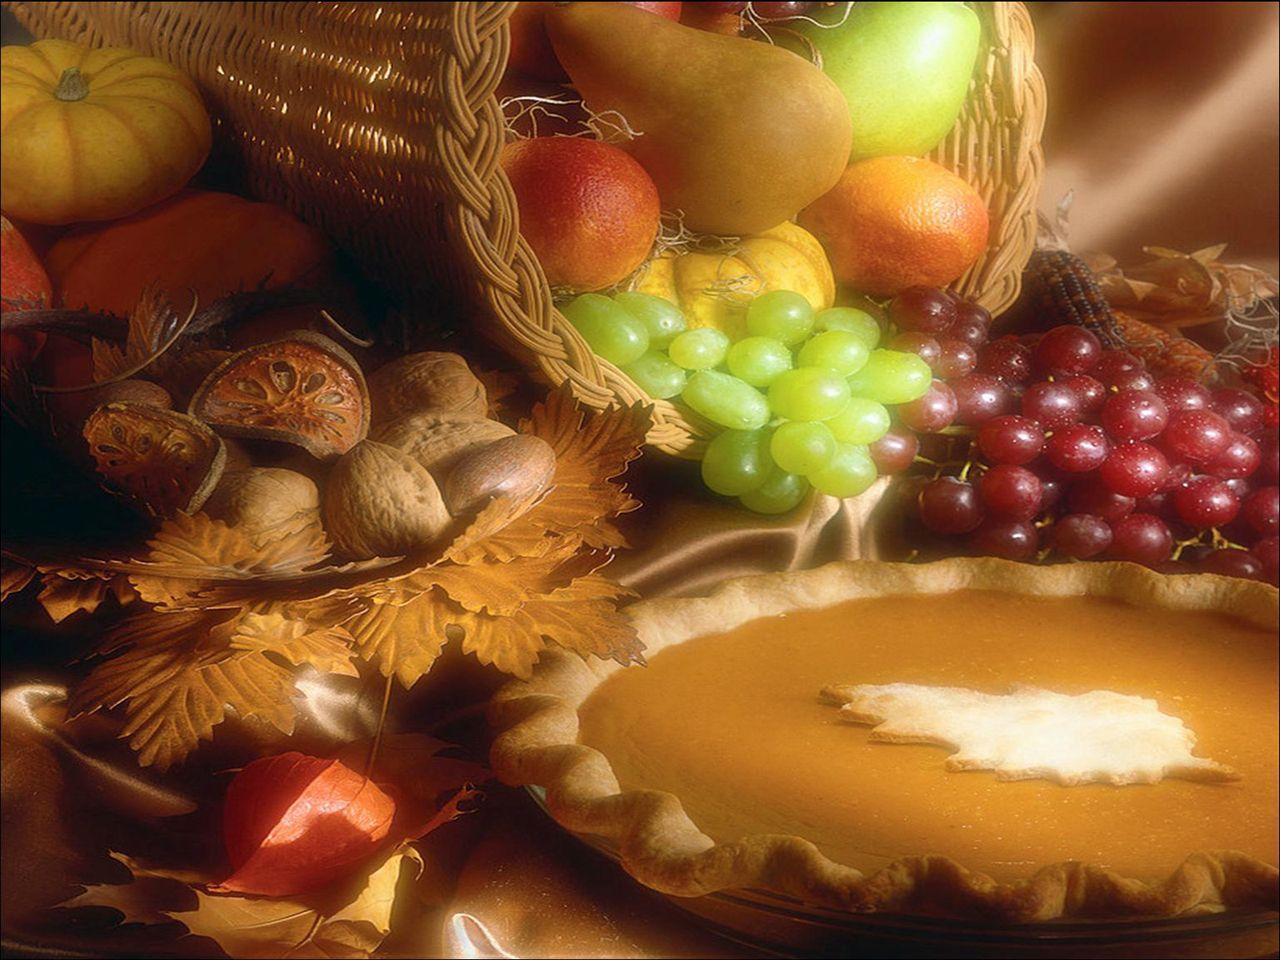 Thanksgiving desktop backgrounds wallpaper cave - Thanksgiving wallpaper backgrounds ...